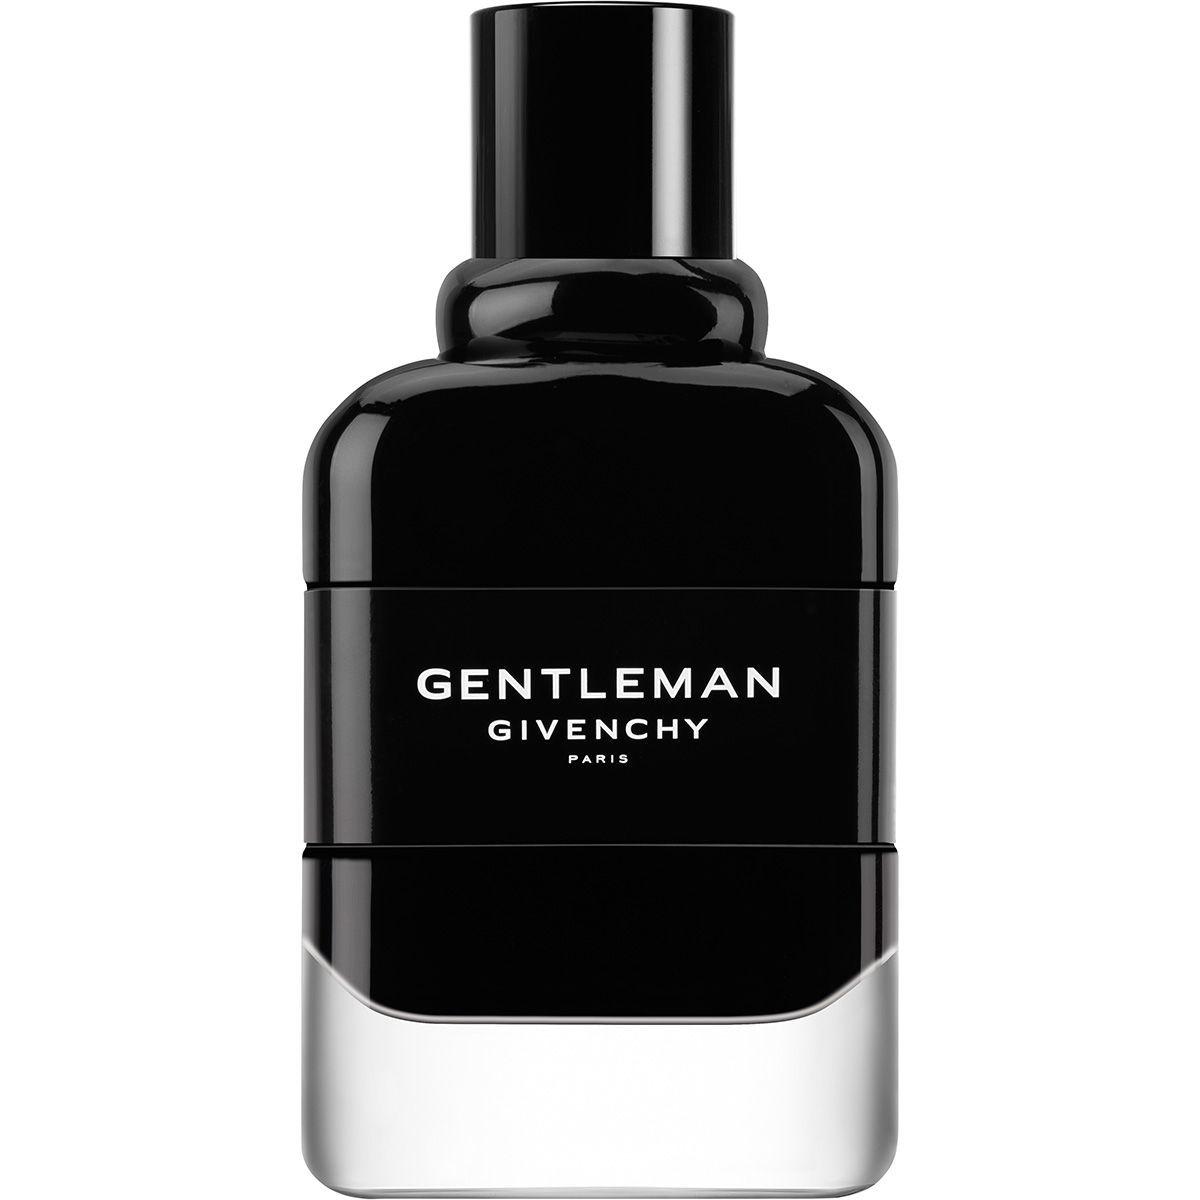 Givenchy gentleman eau de parfum 50ml vaporizador